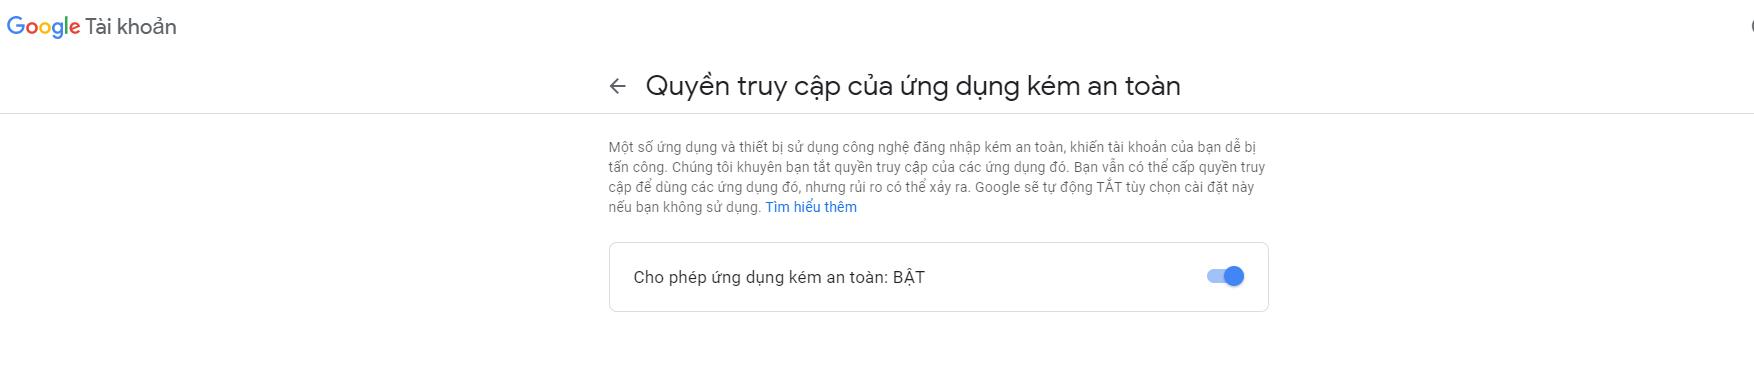 Google Setting Account Send Mail Image